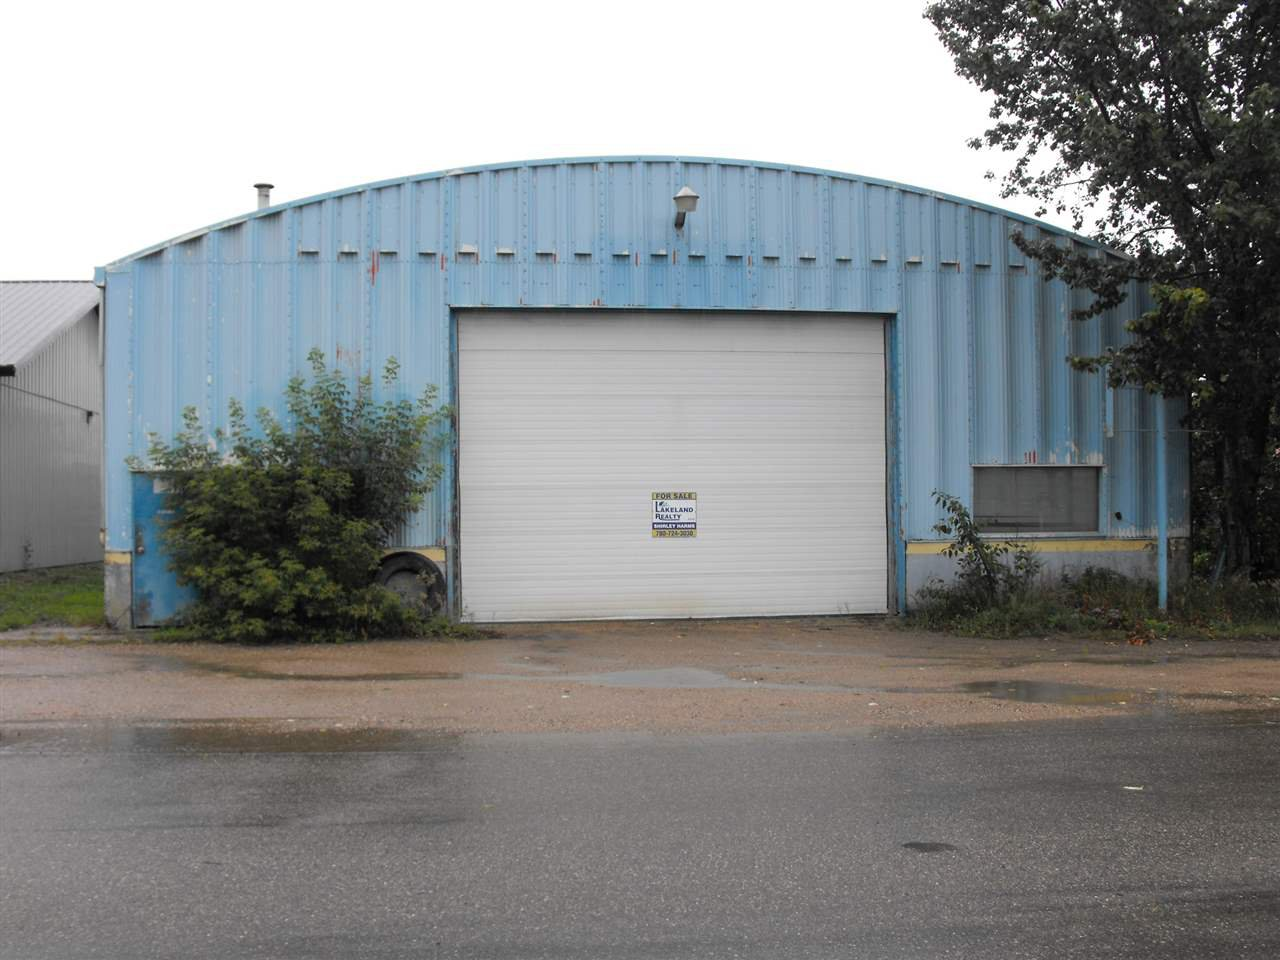 Main Photo: 4914 Railway Avenue: Elk Point Industrial for sale : MLS®# E4180509